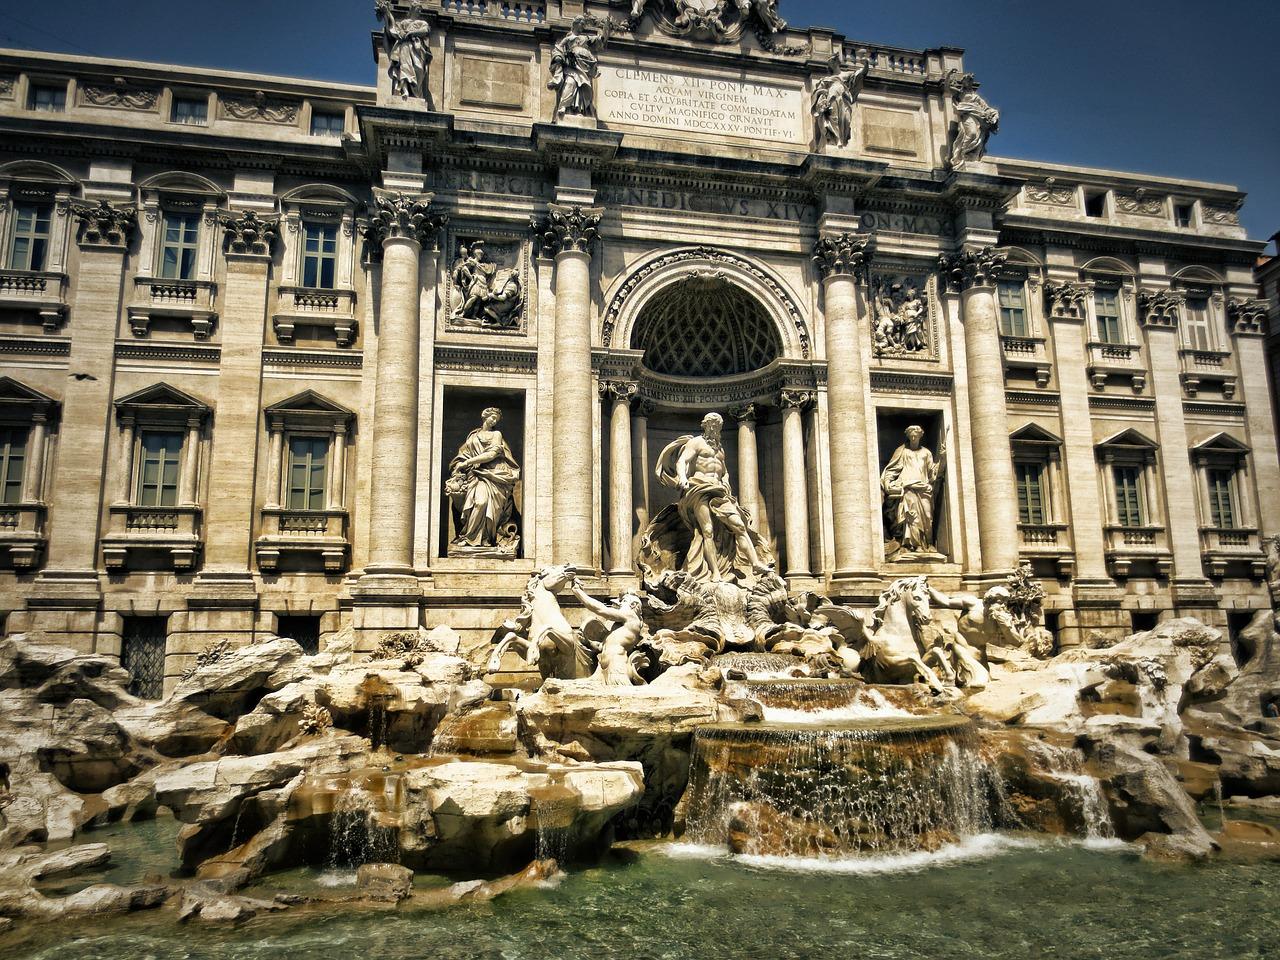 Europe Trip Planner | GeoLuxe Travel LLC | European building